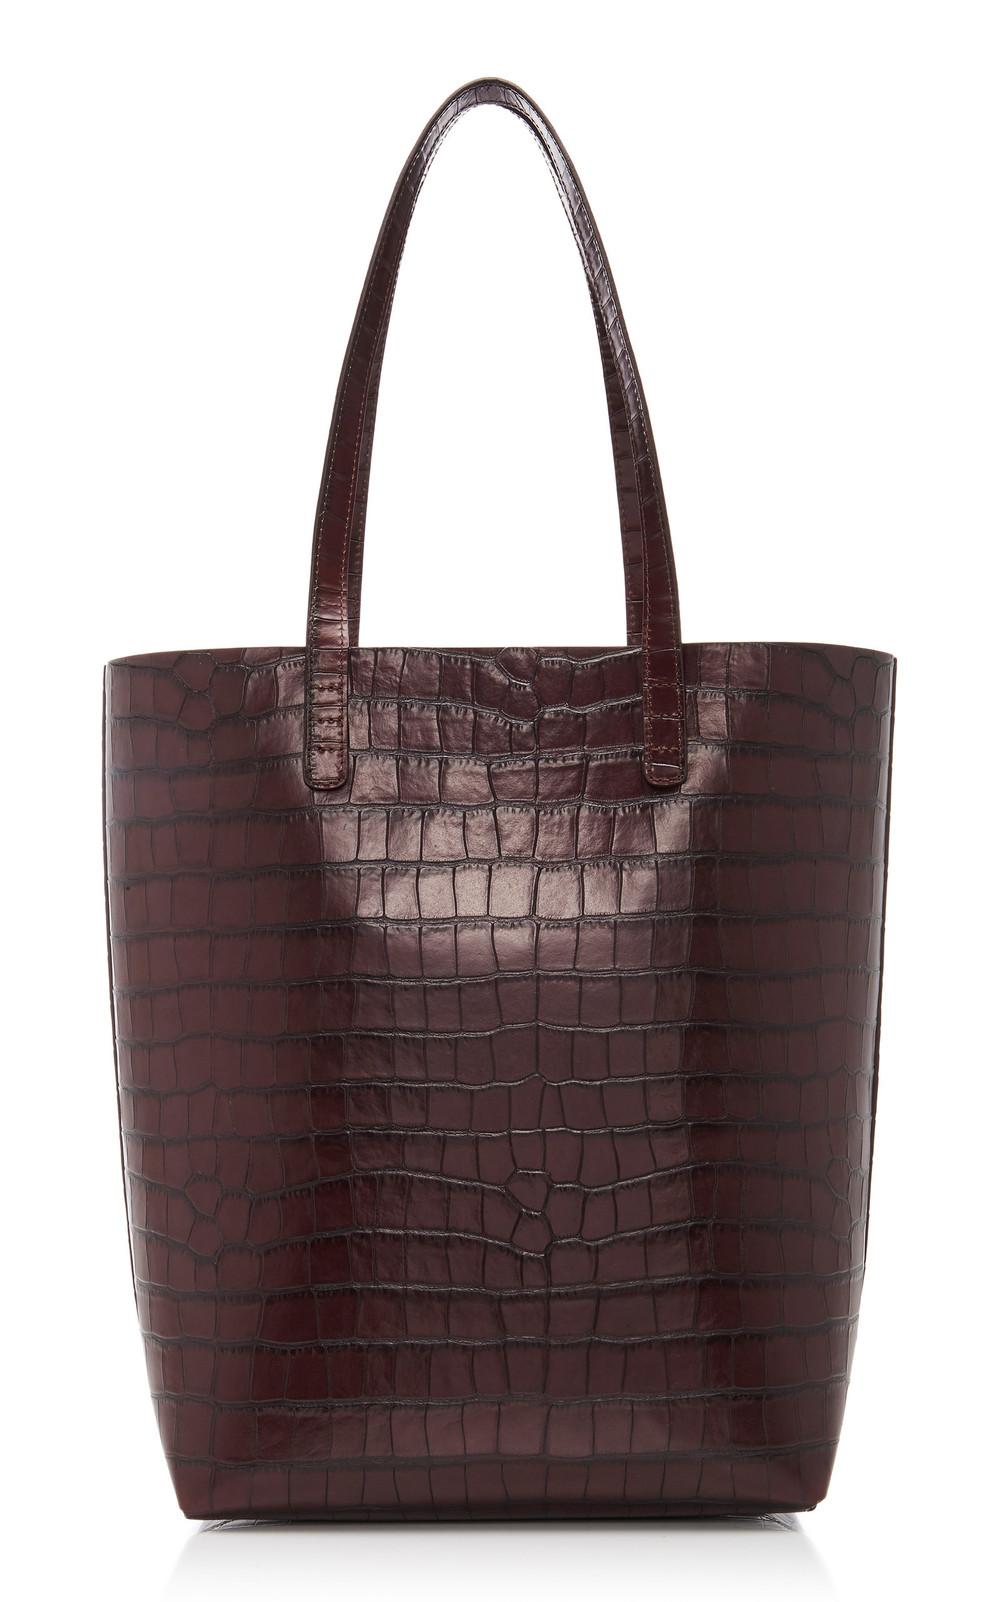 Mansur Gavriel Everyday Croc-Embossed Leather Tote Bag in black